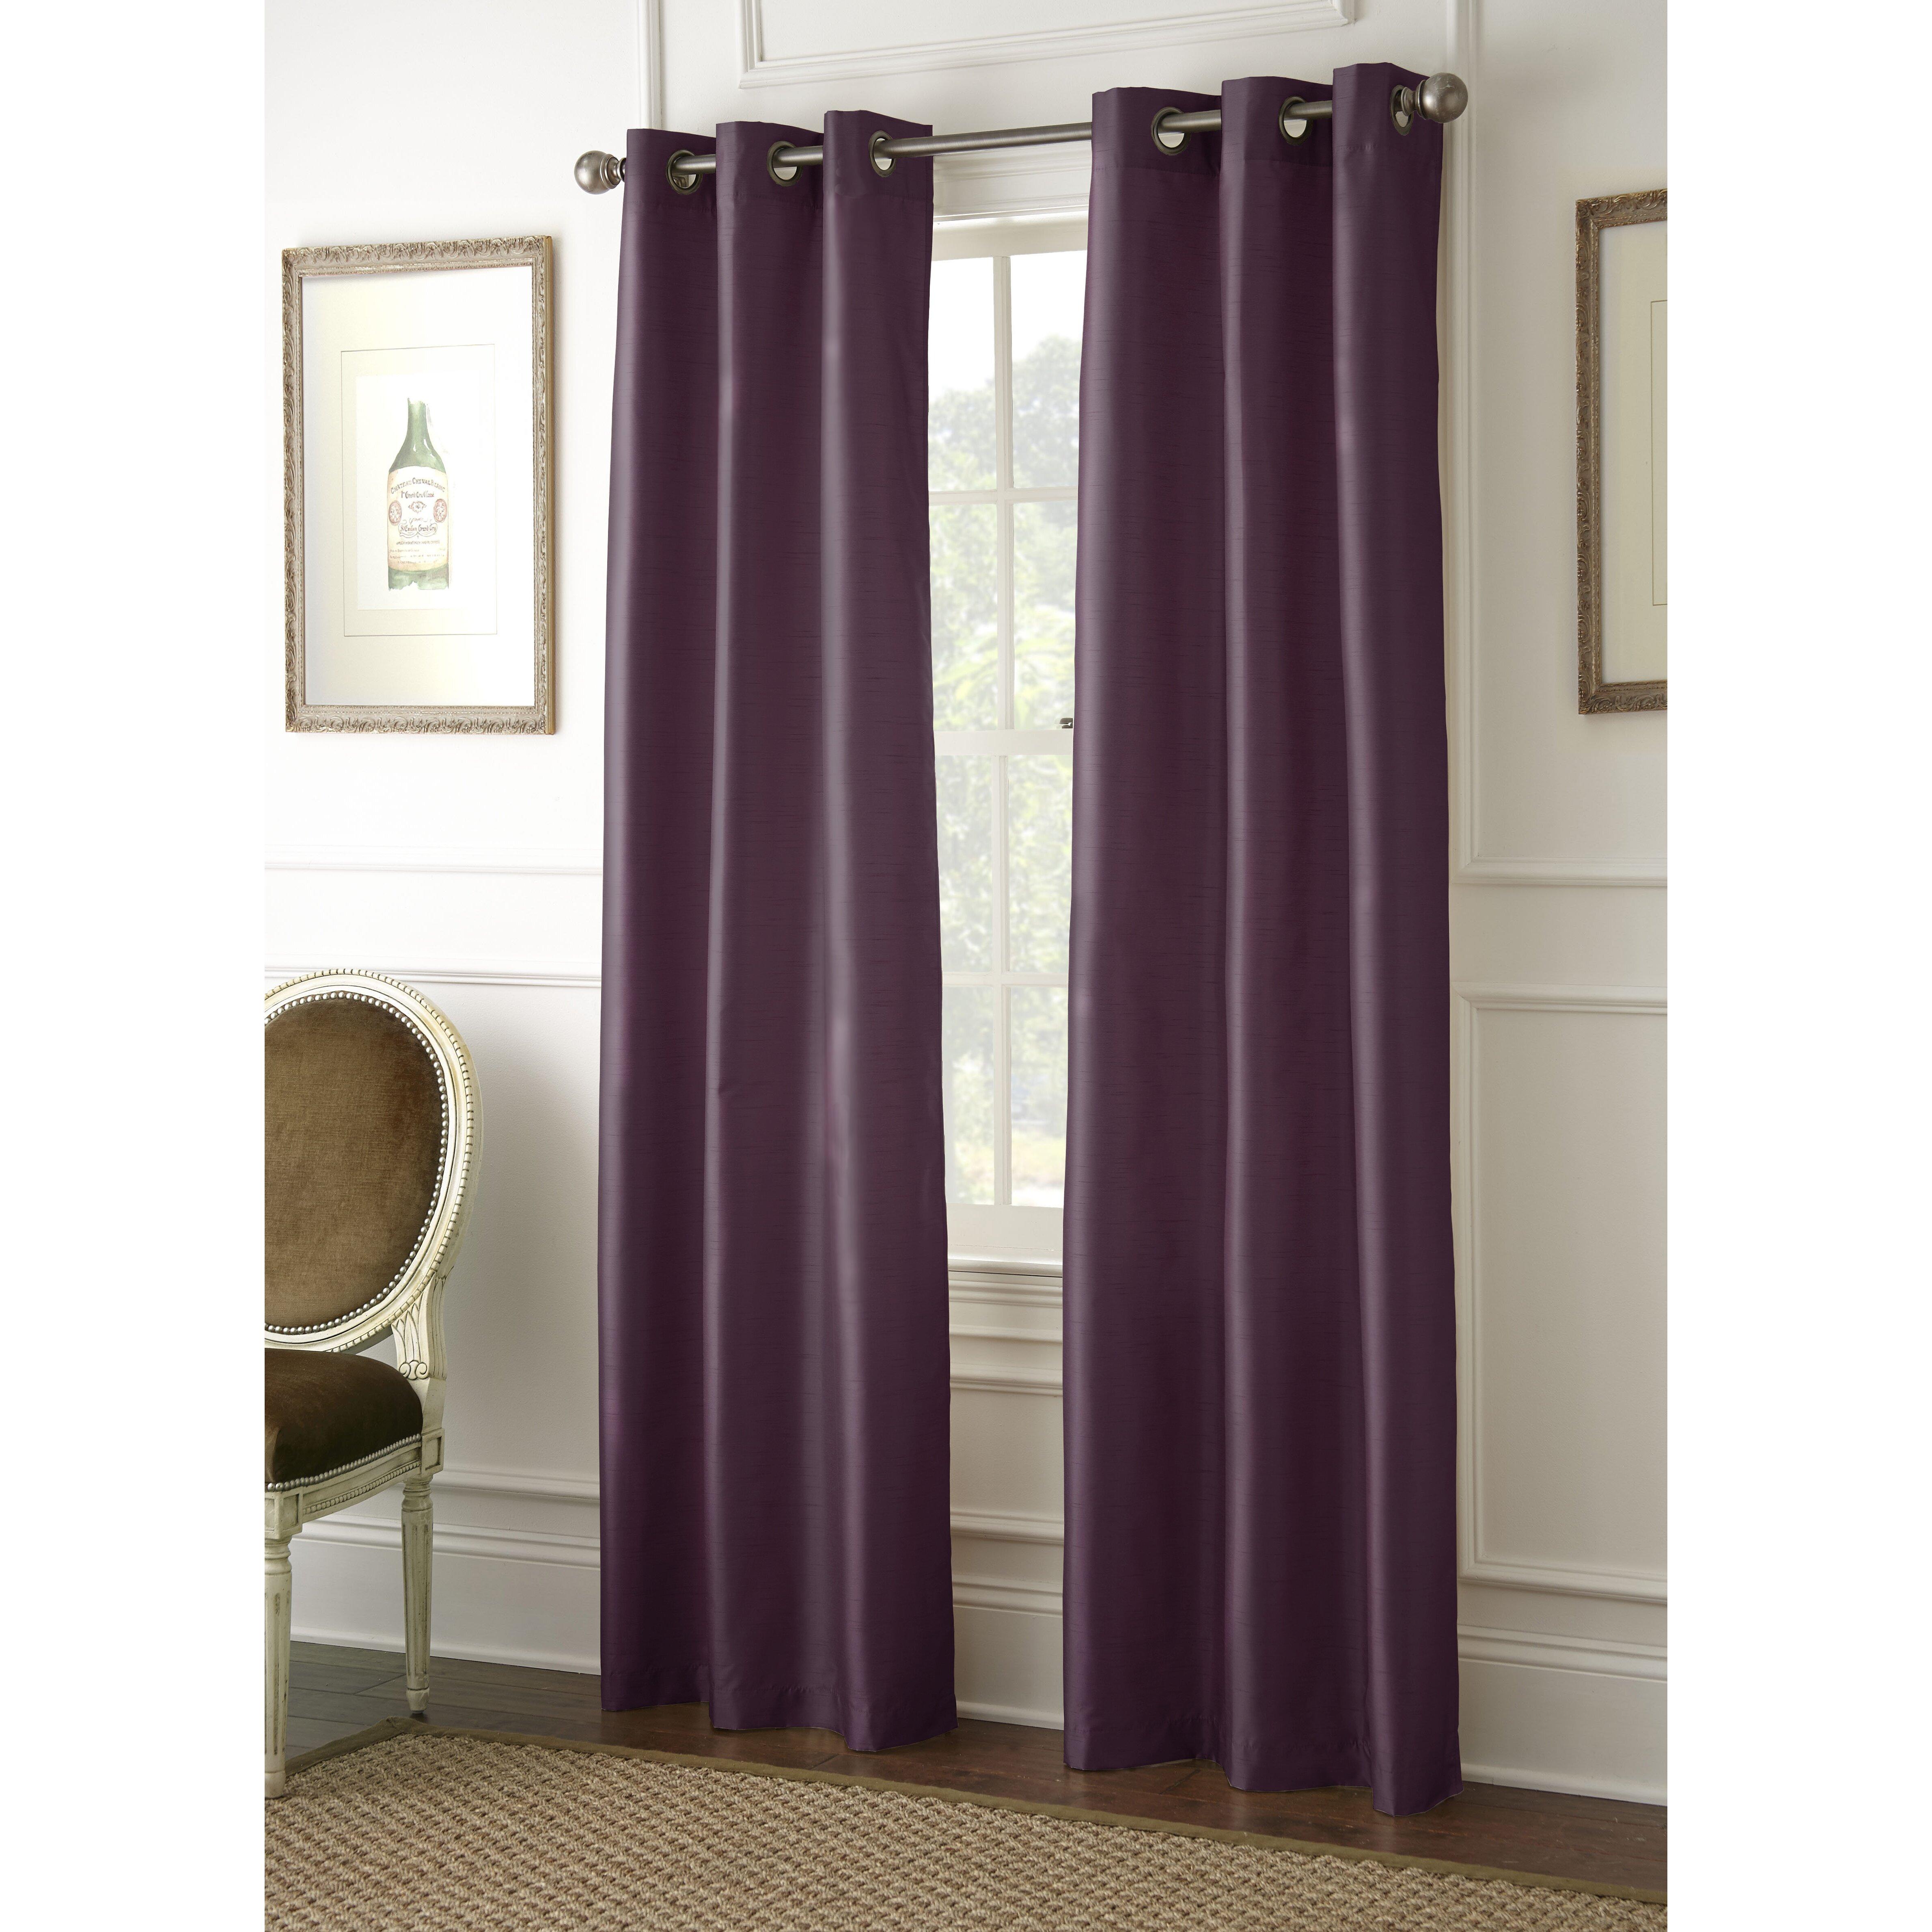 Crest home design shower curtains curtain menzilperde net for Crest home designs curtains